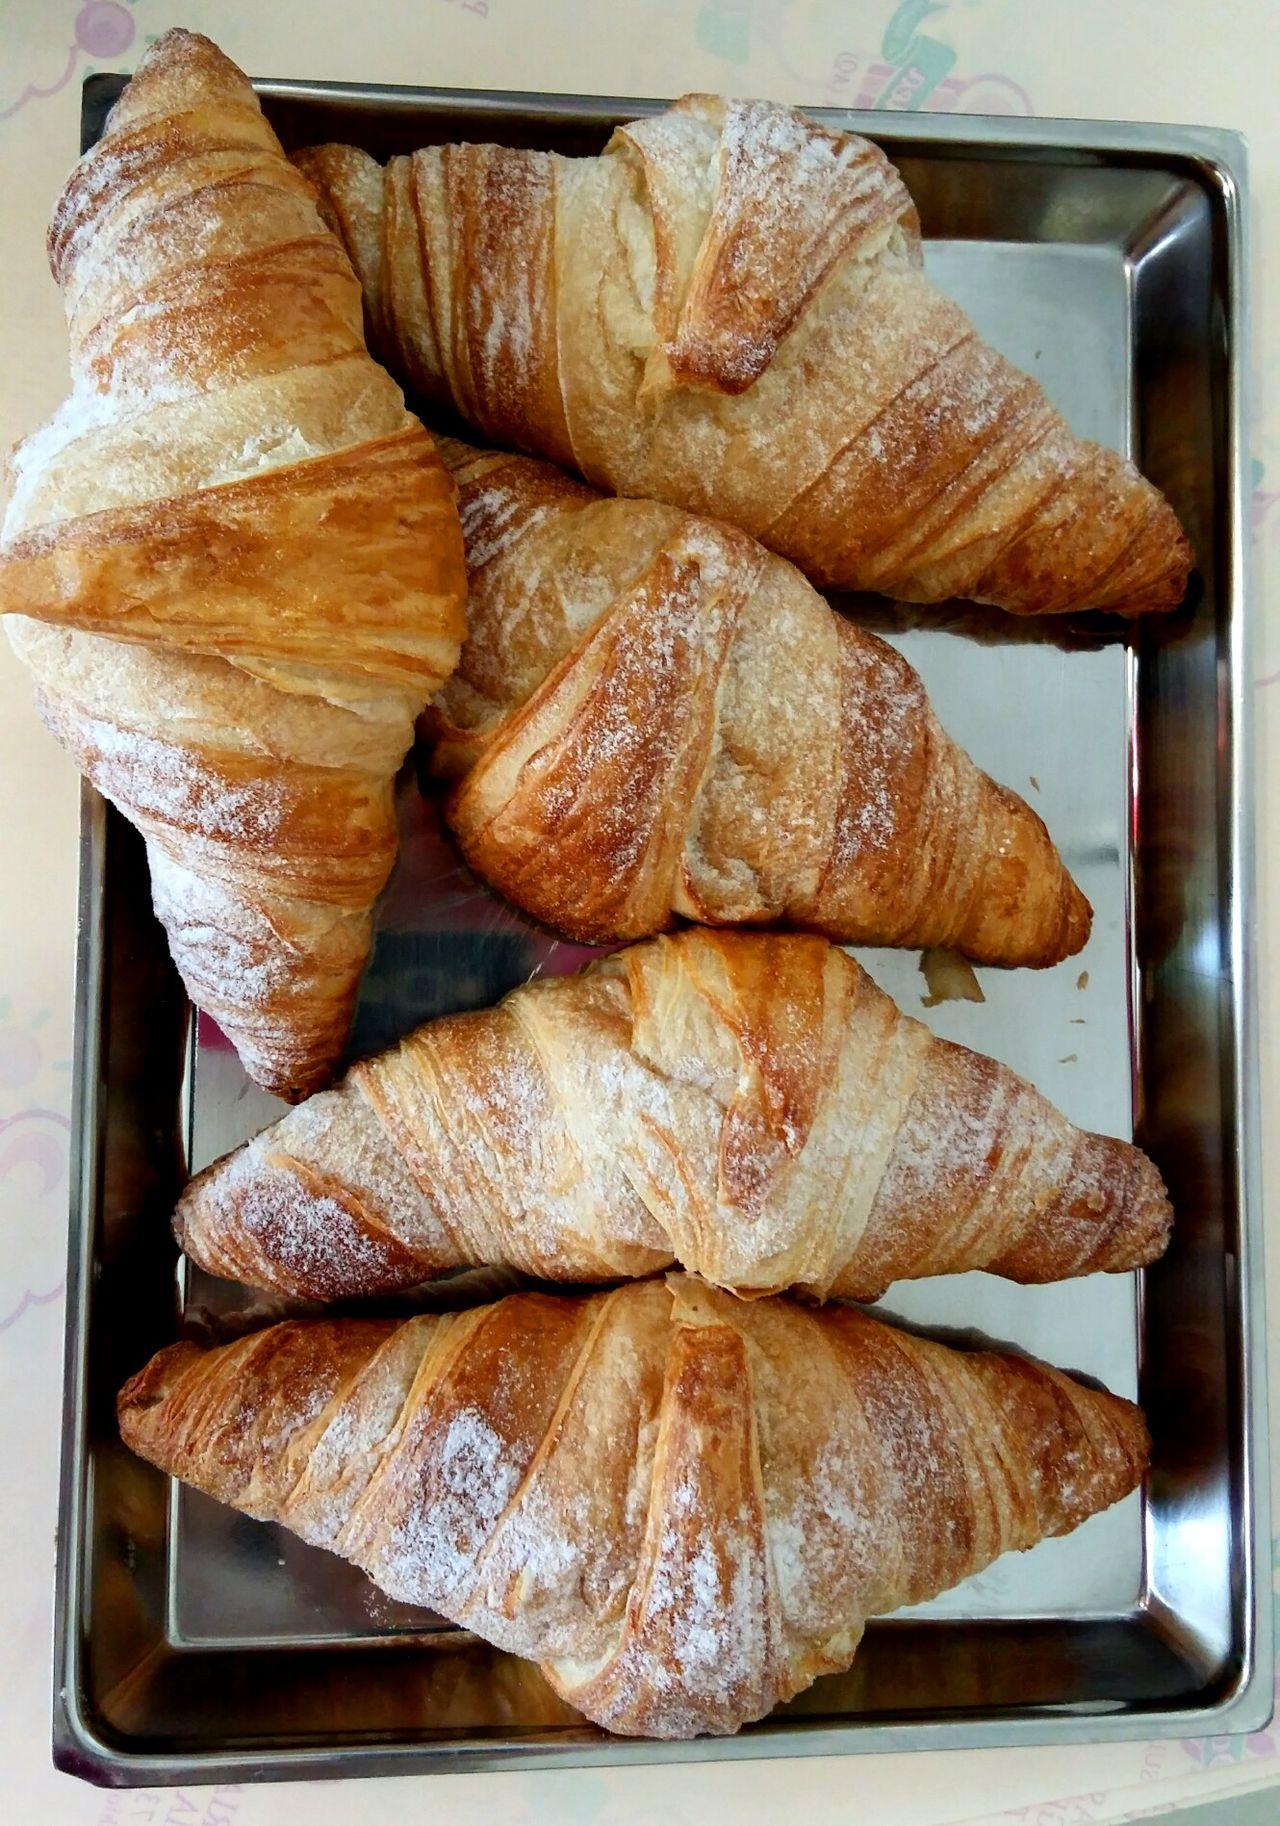 Show Us Your Takeaway! Cake Homemade Food Farina Cucina Cucinare Zucchero Cornetto Croissant Croissant For Breakfast Breakfast Takeaway Colazione Colazione Time  Cucinaitaliana Foodphotography